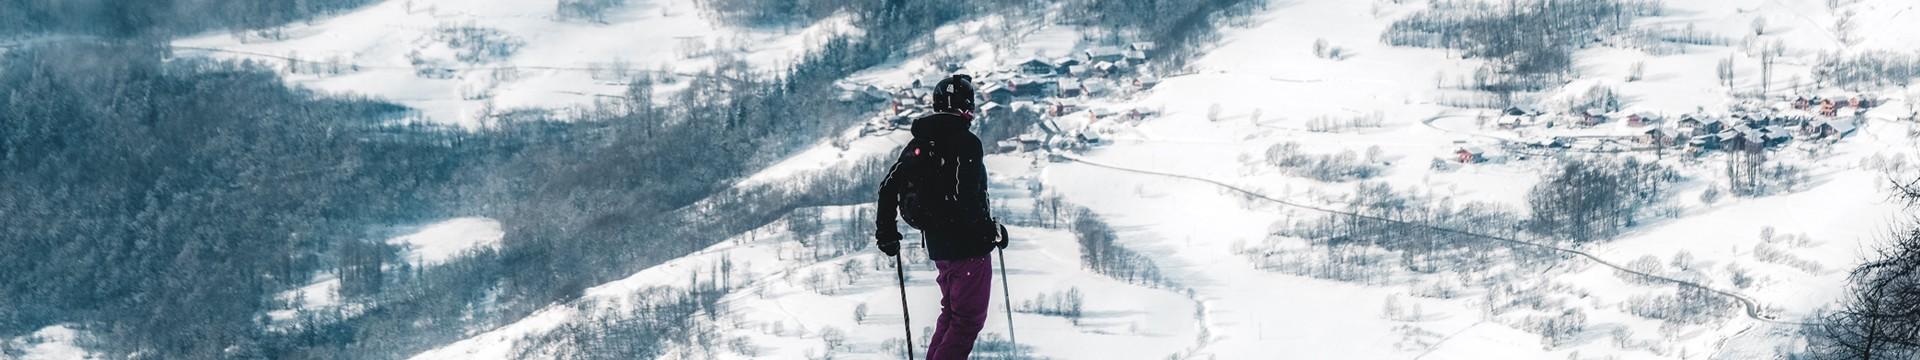 ski-04-8873